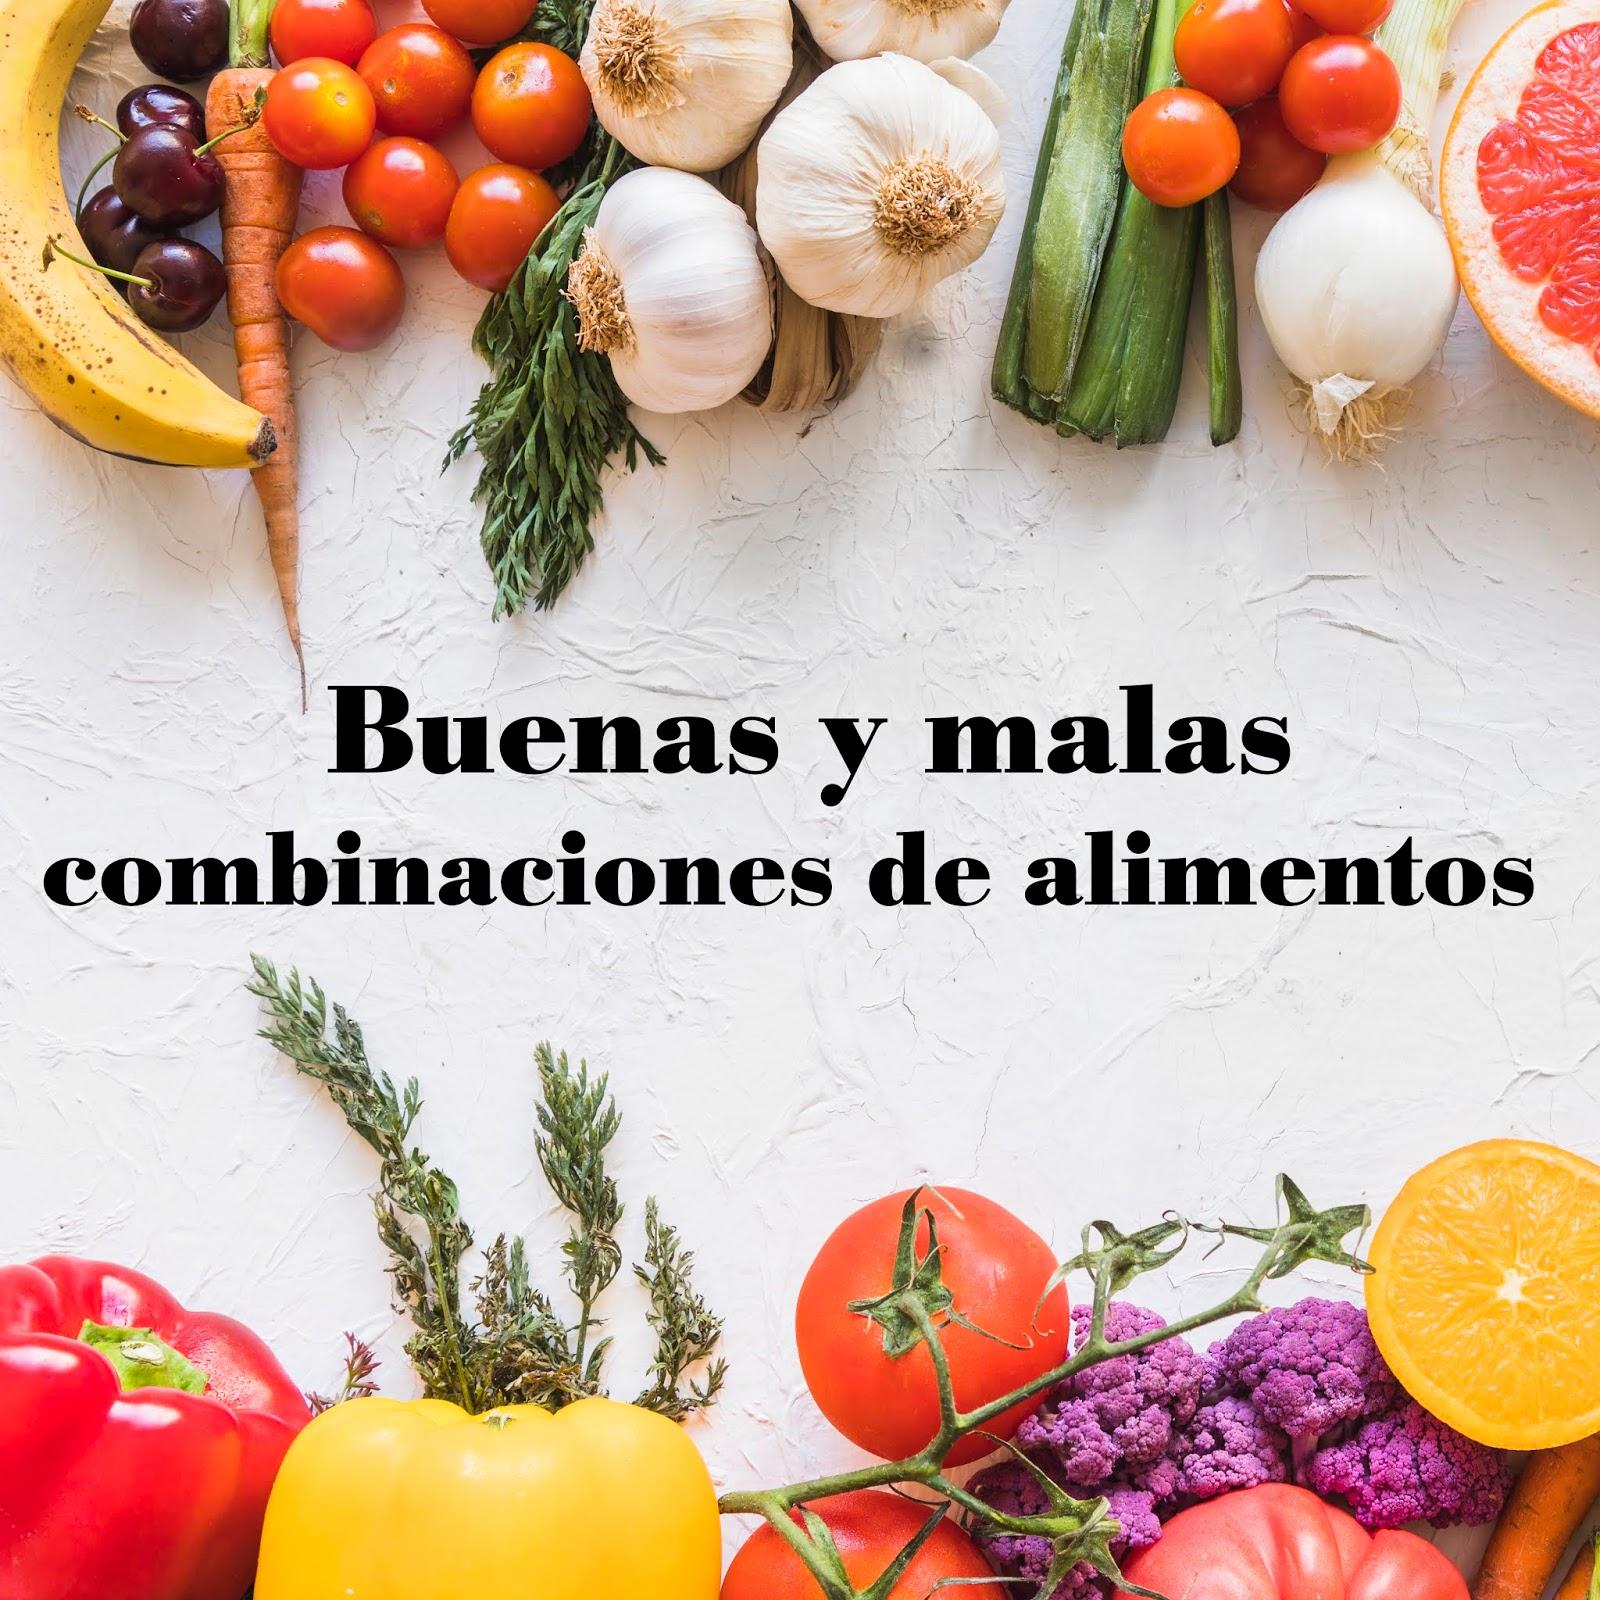 mejores recetas de comida dietética